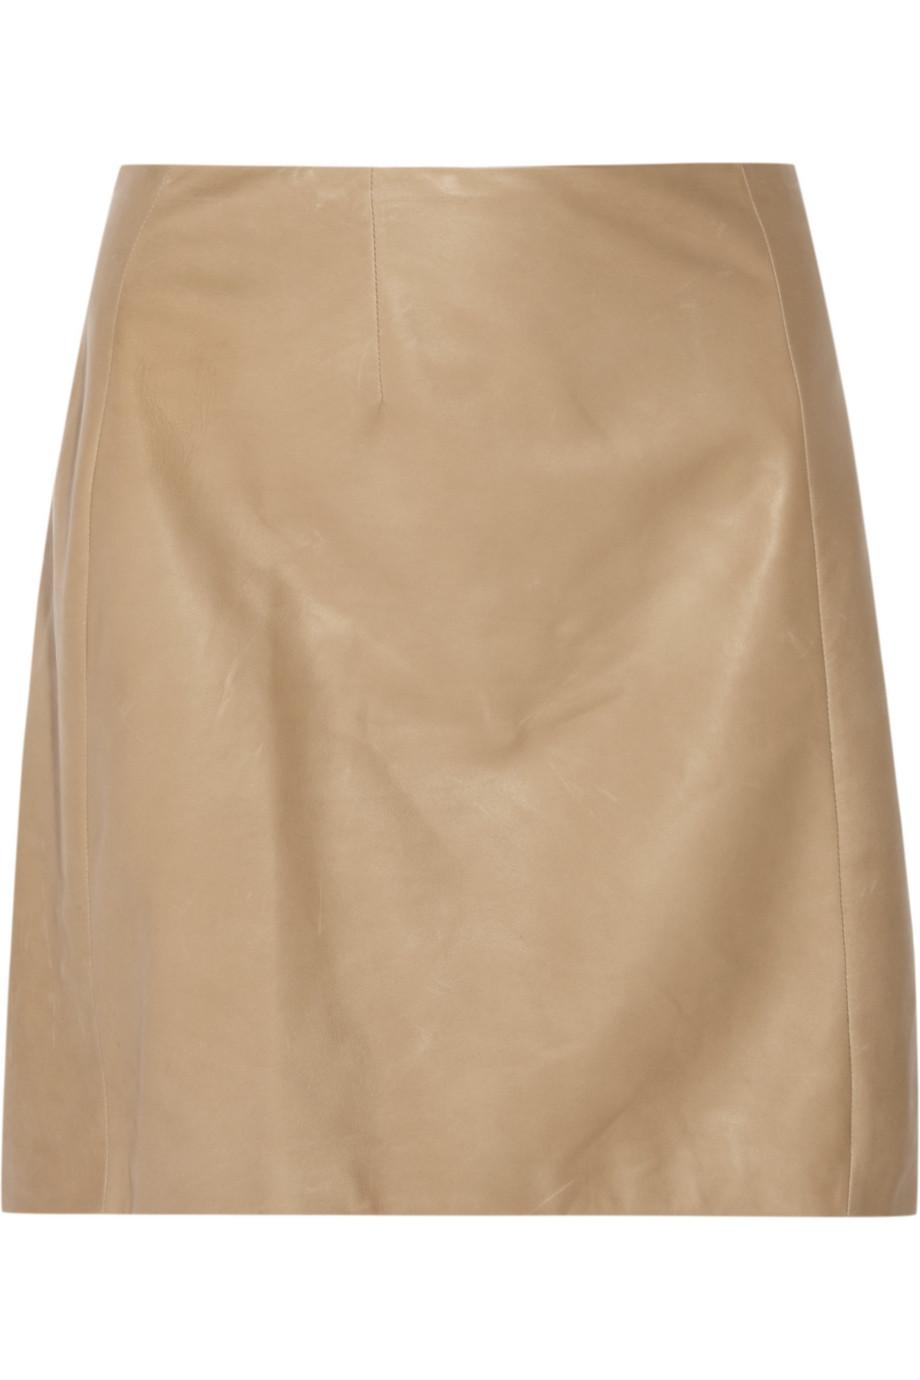 calvin klein leather a line skirt in beige camel lyst